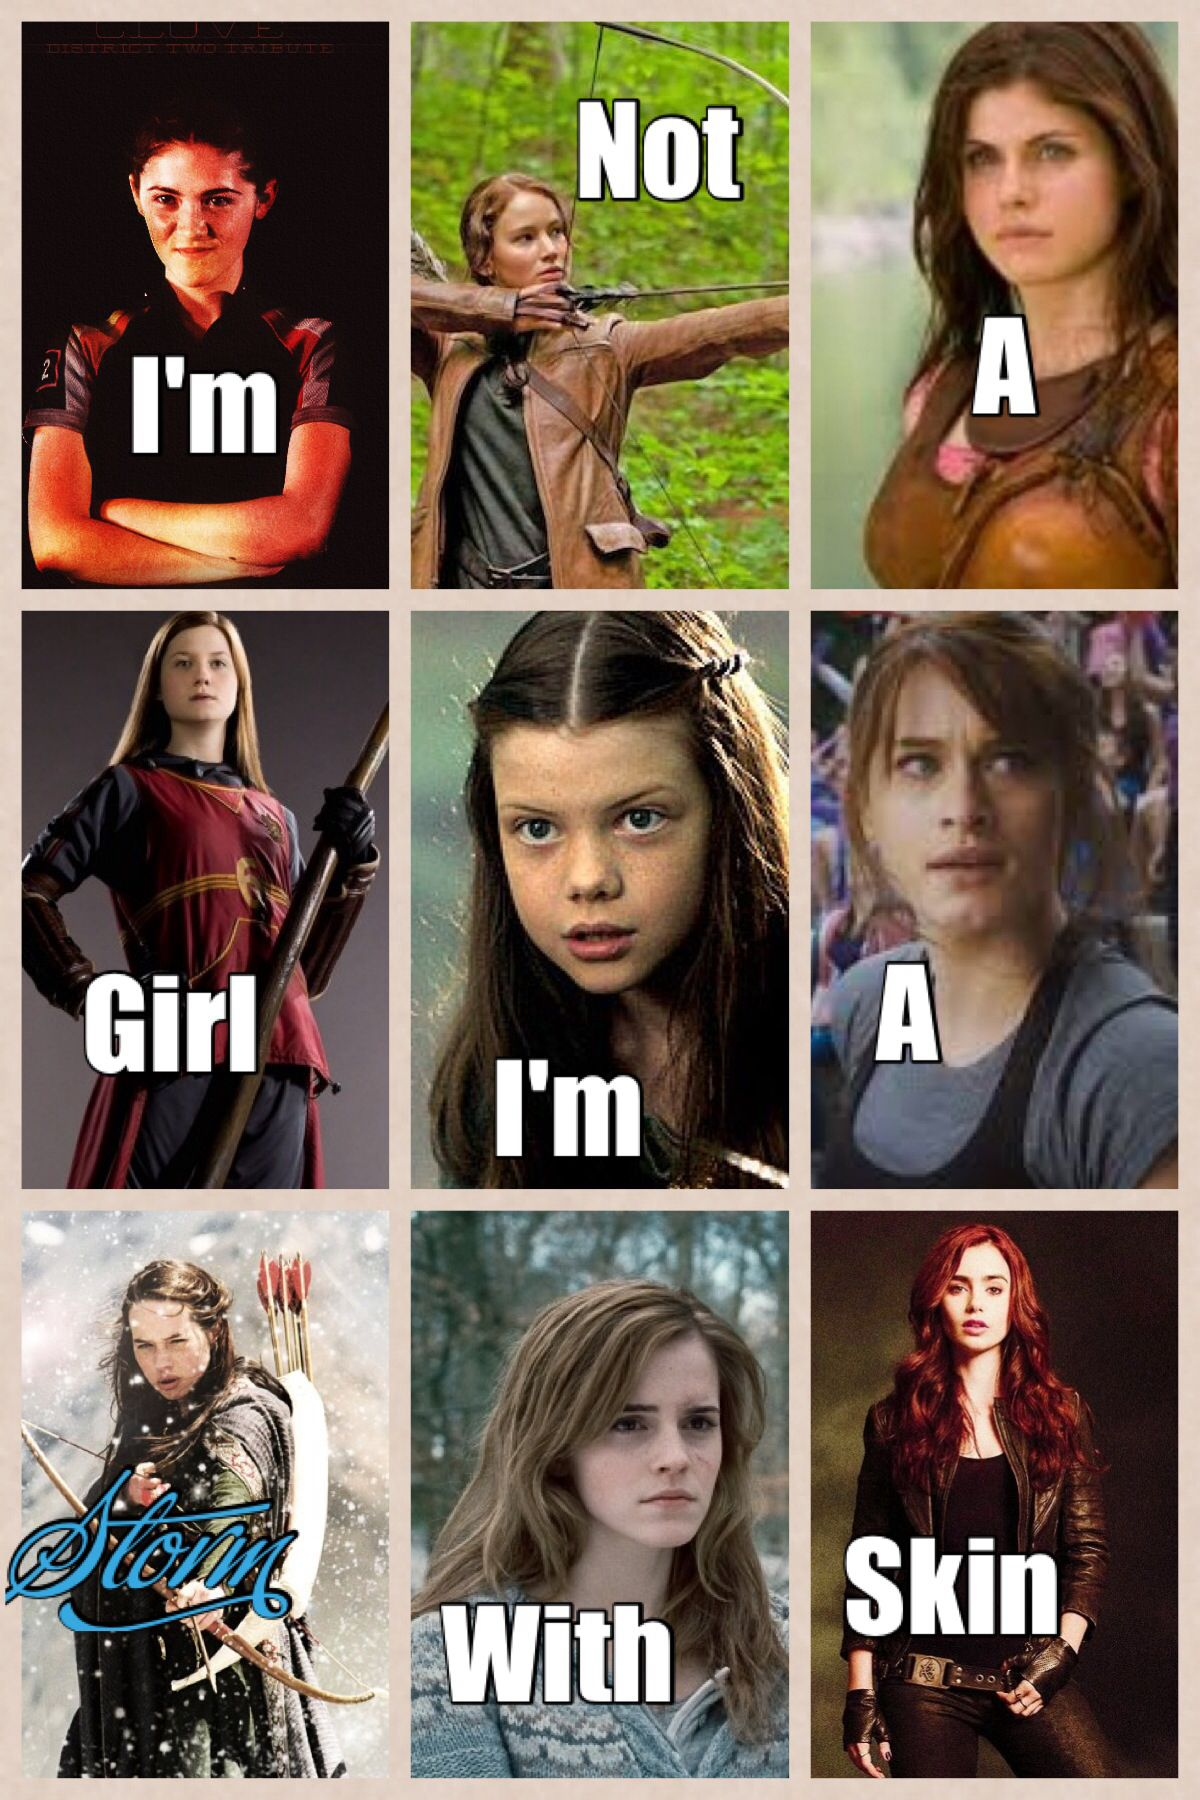 Girl Power Screw Guys